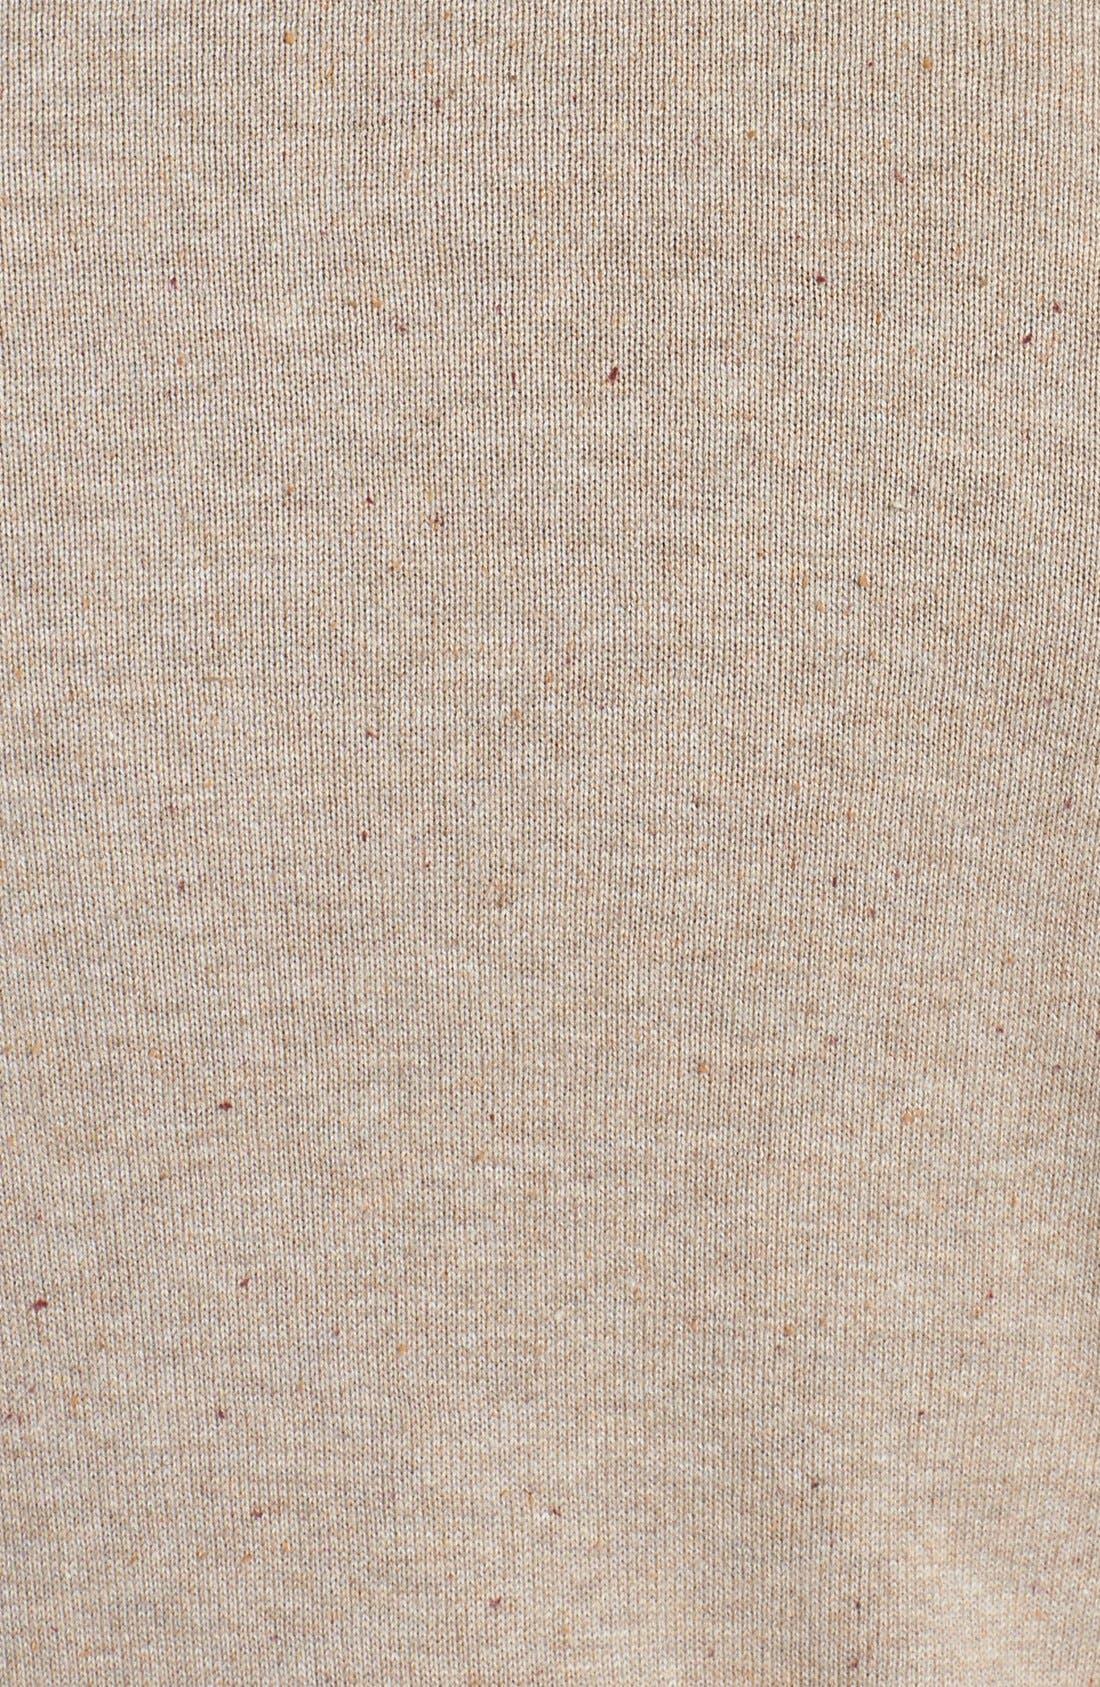 Alternate Image 3  - Topman Shawl Sweater